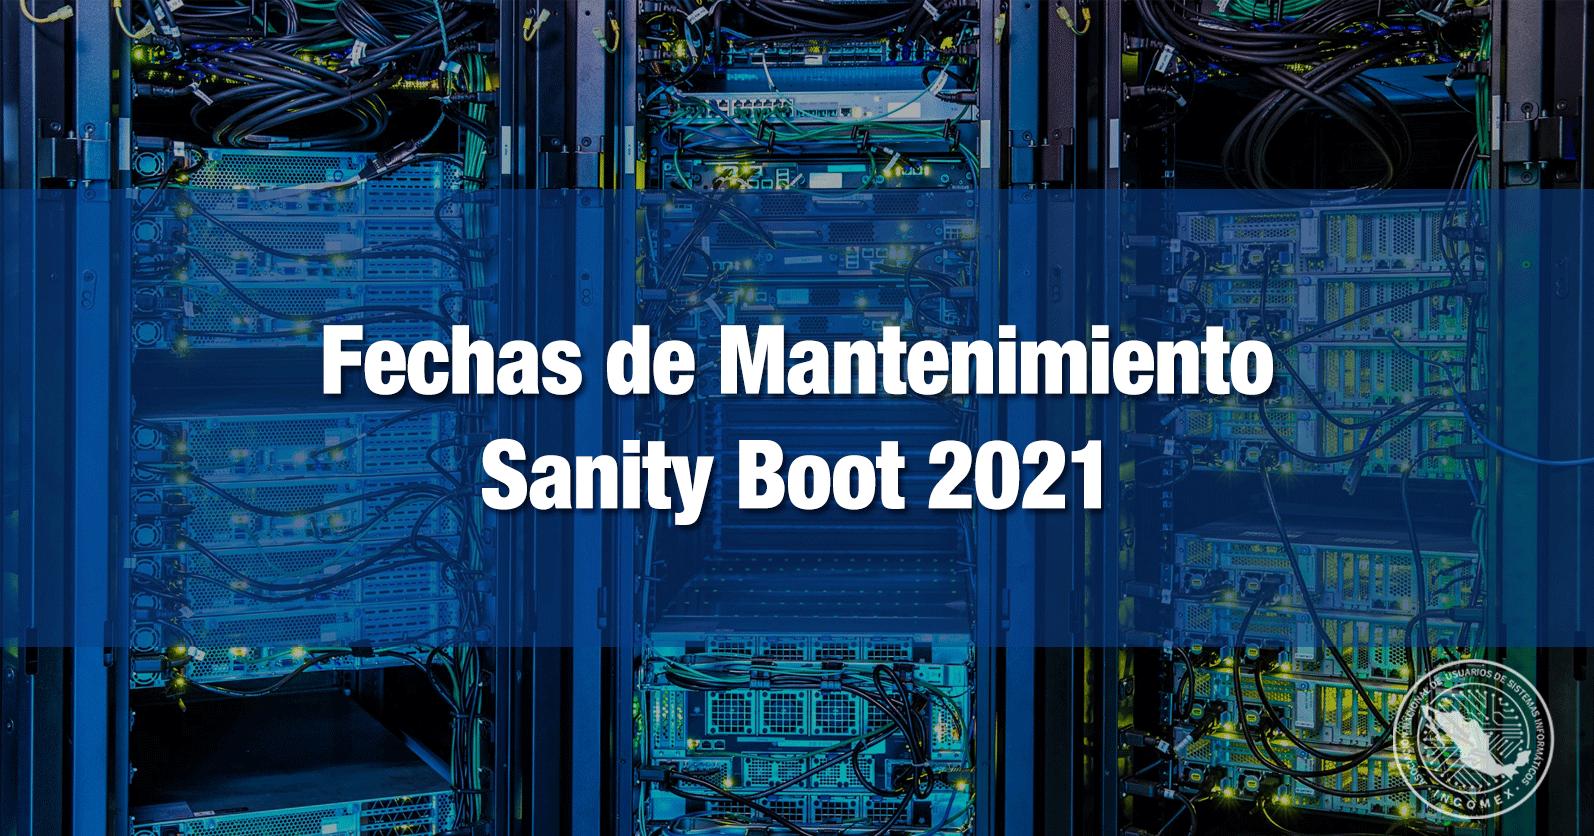 Fechas de Mantenimiento Sanity Boot 2021